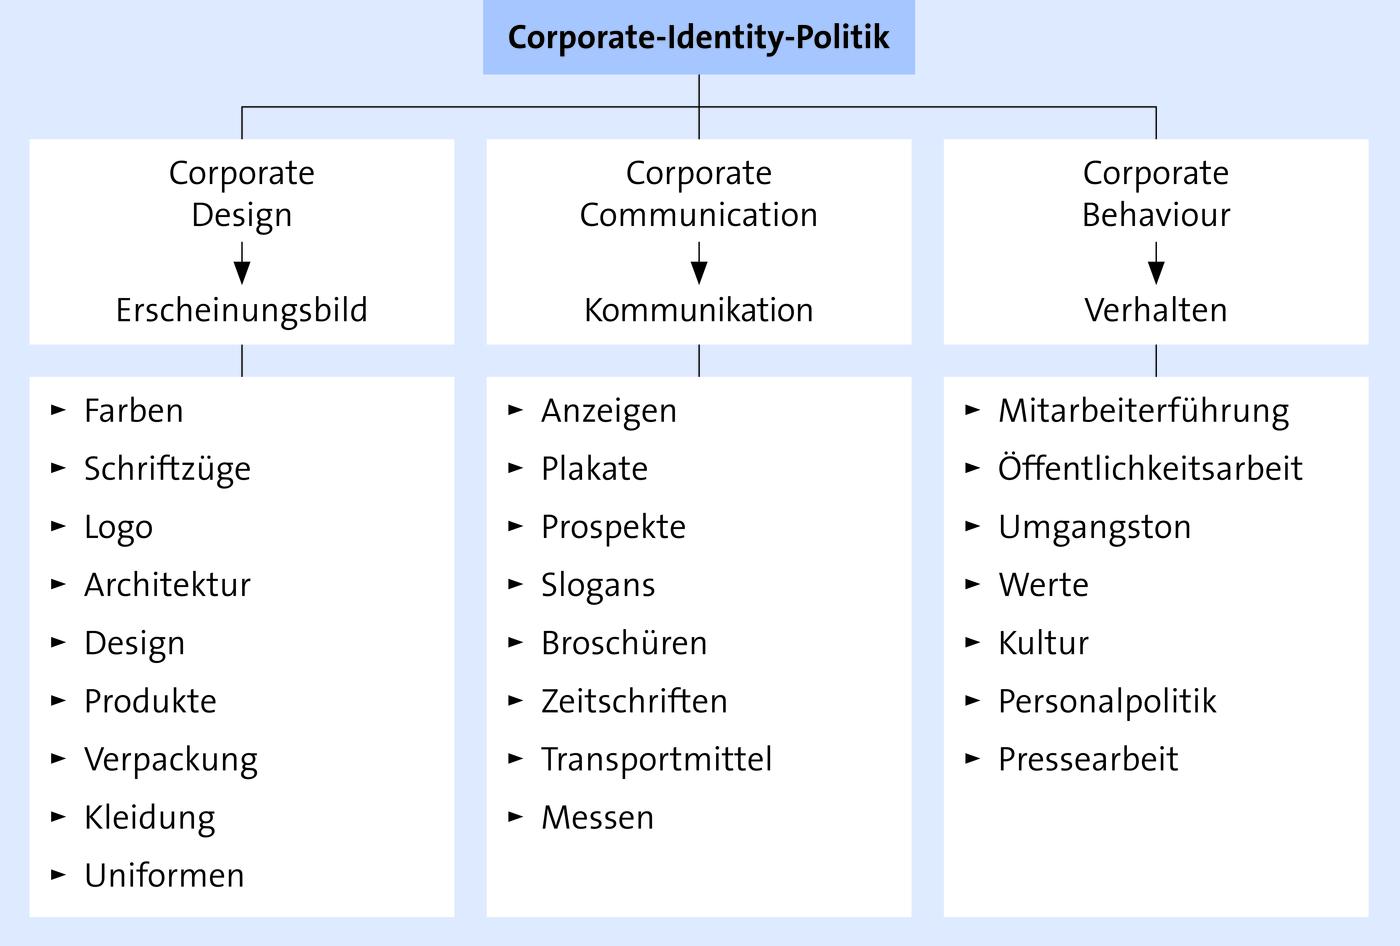 Unternehmensphilosophie Definition And Synonyms